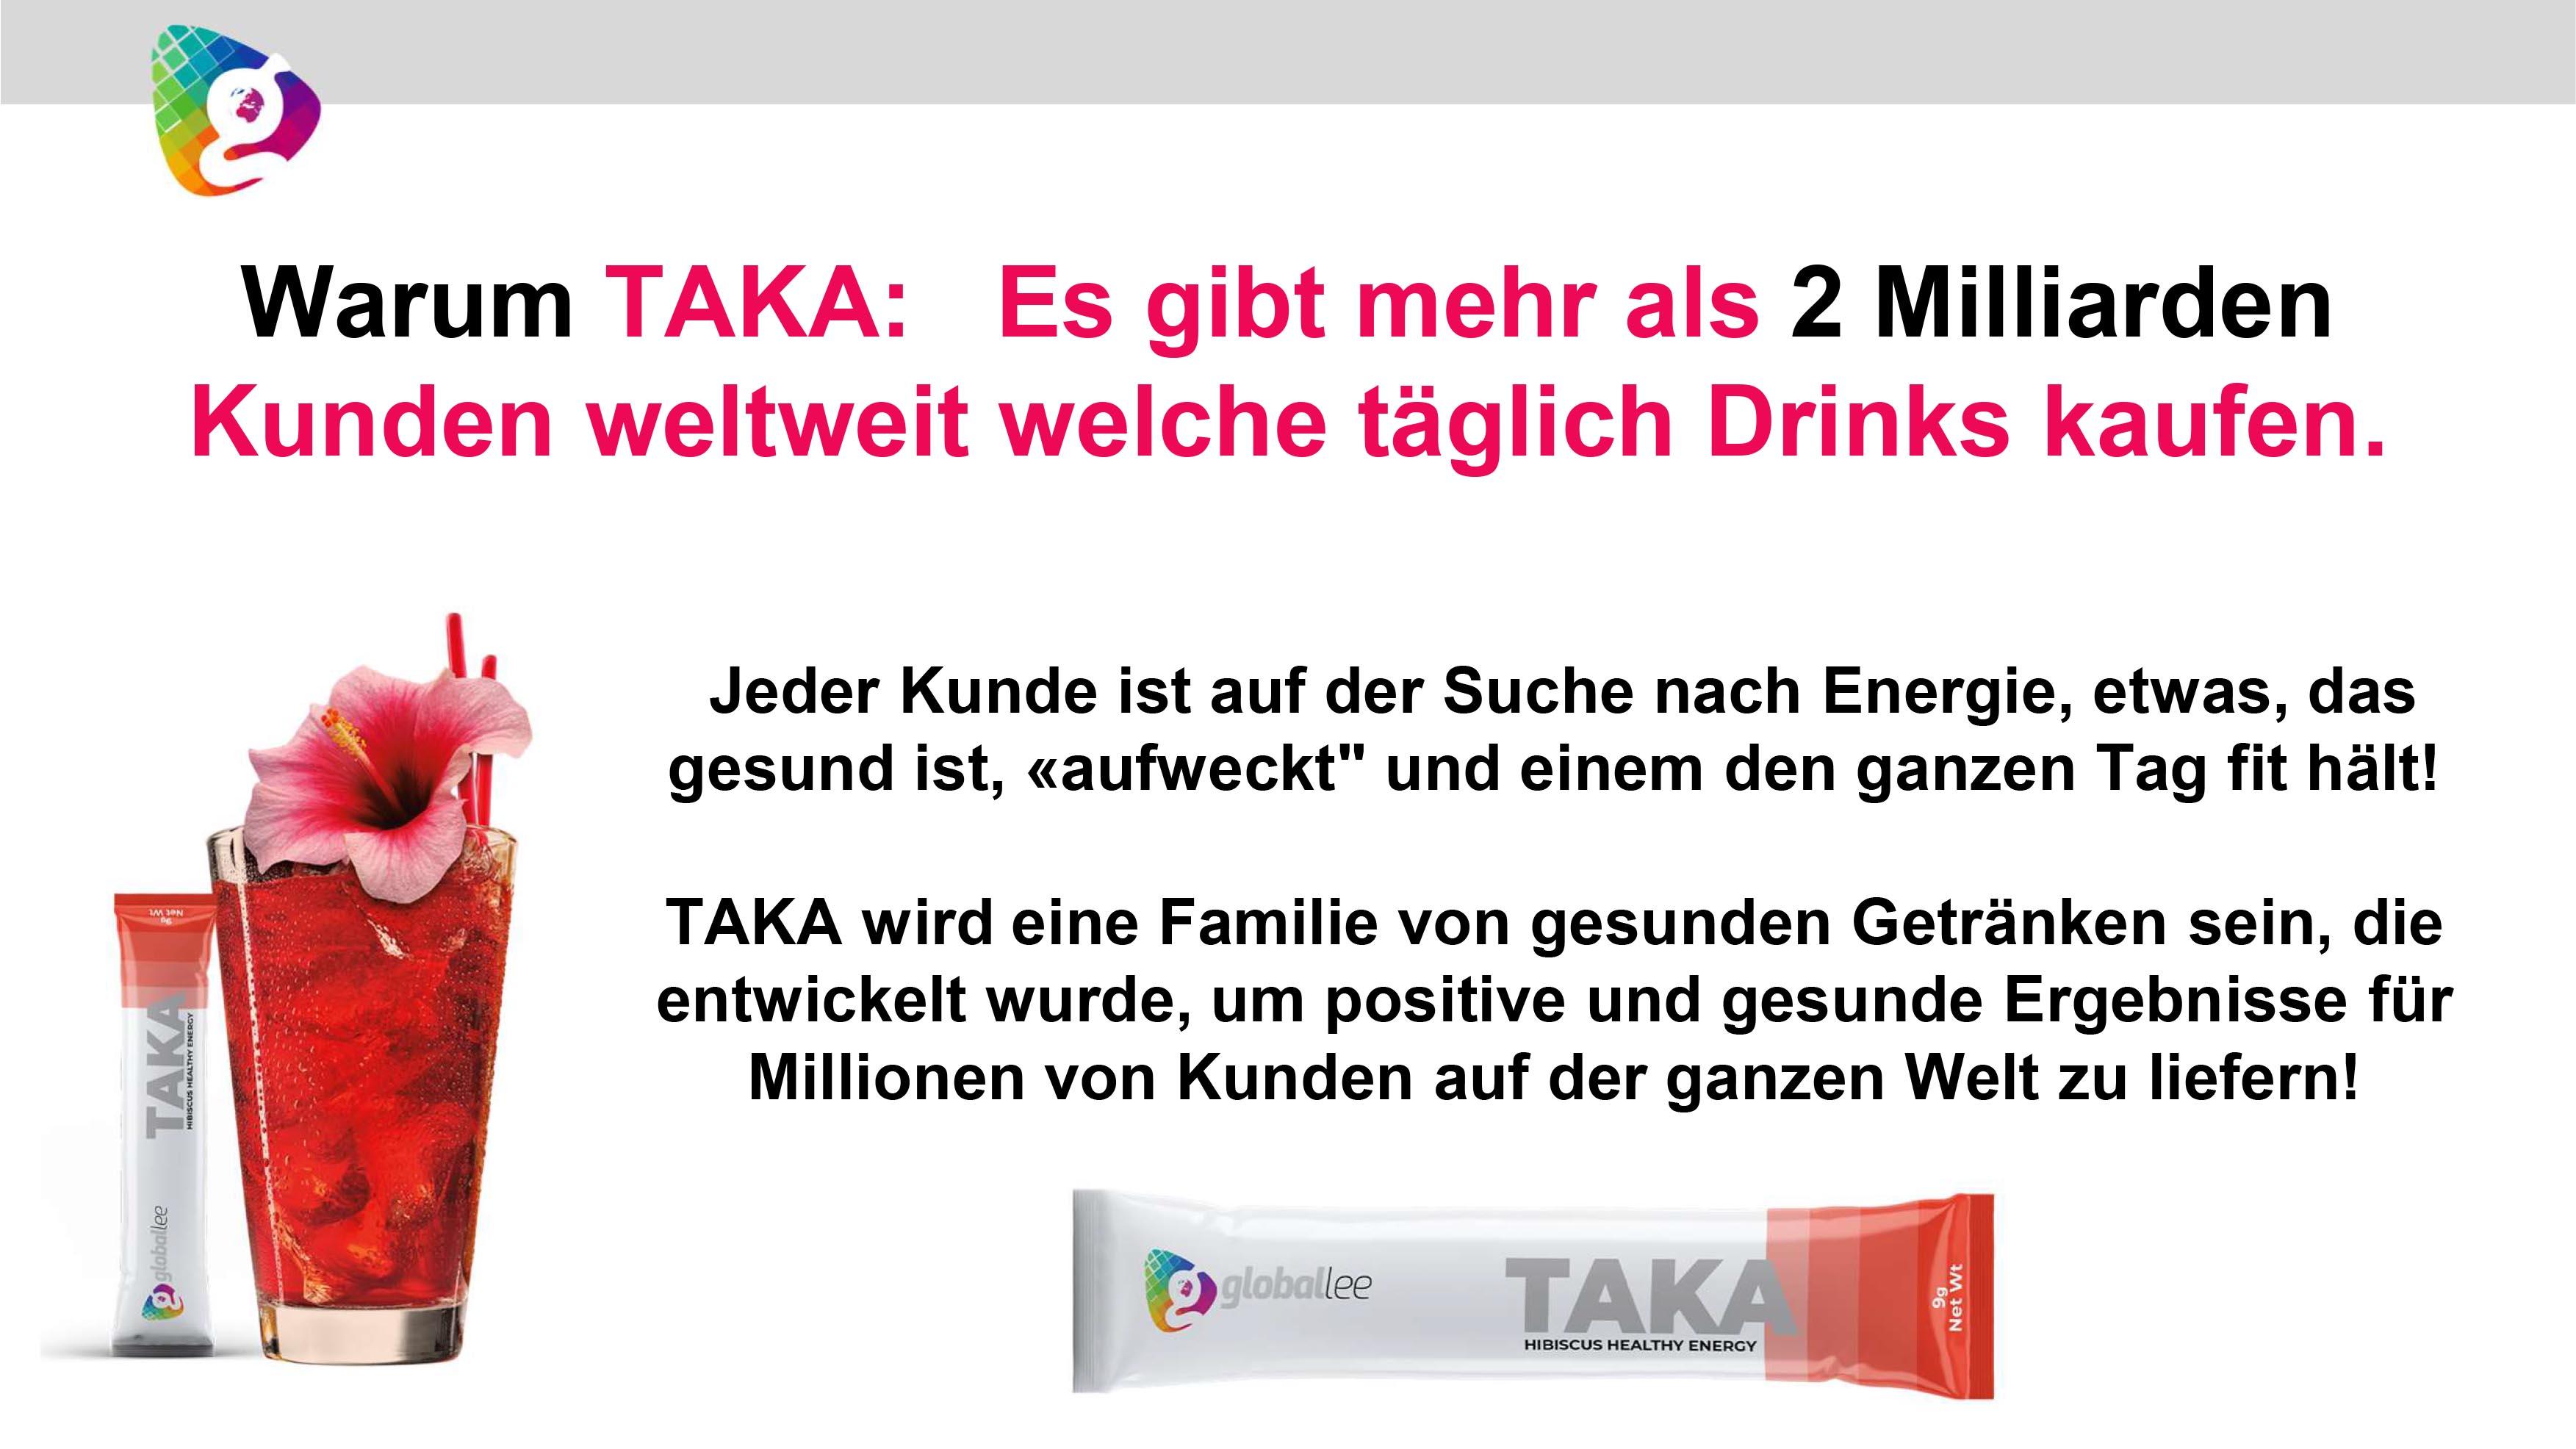 Der gesunde Energie Drink